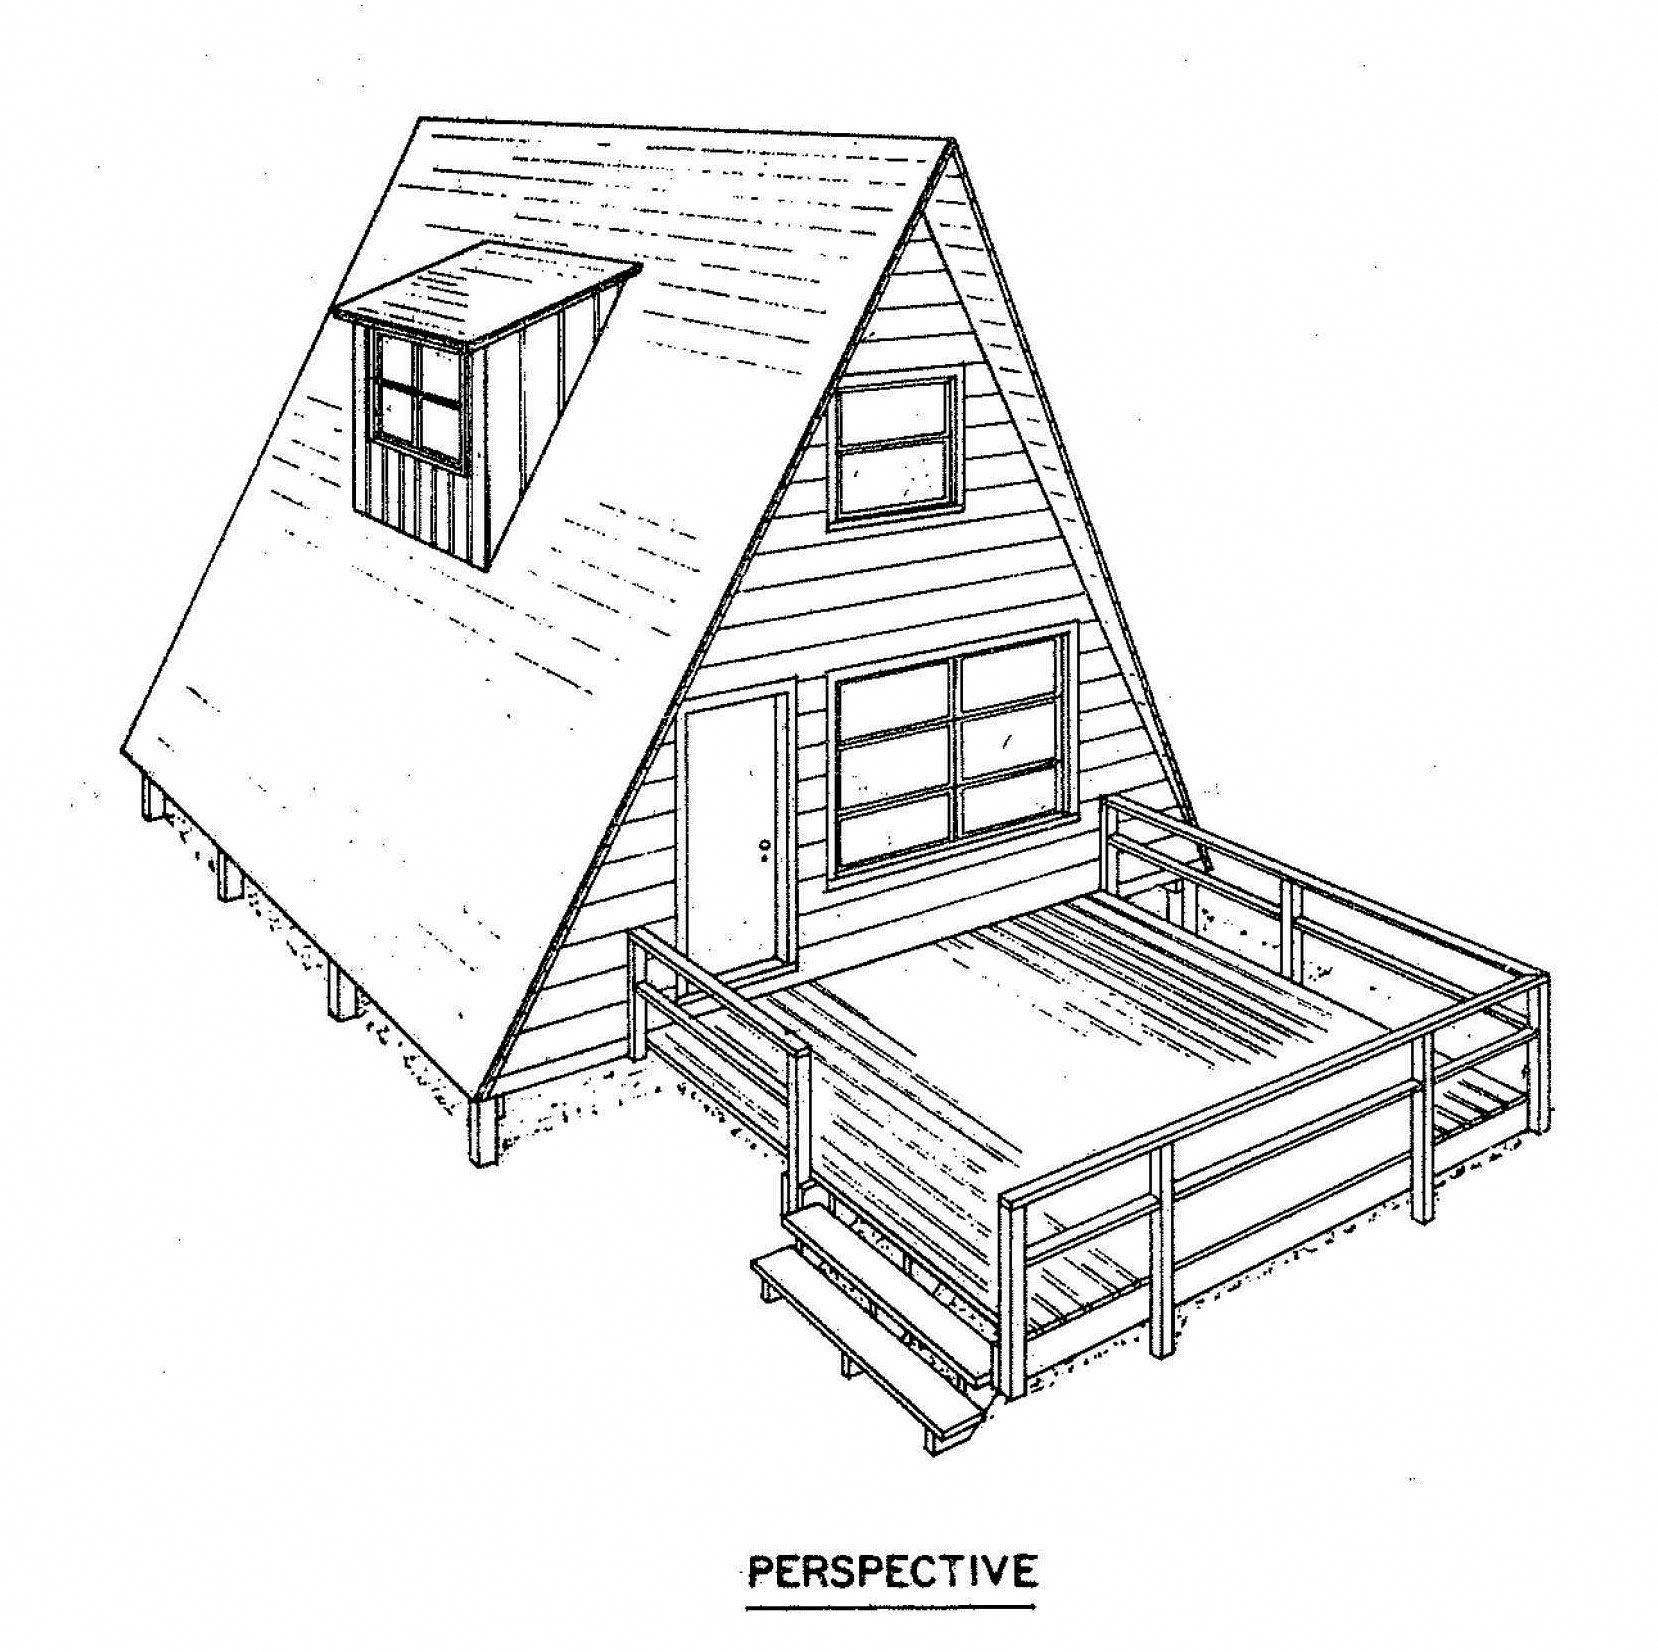 A Frame House Plan Perspective A Framecabin A Frame House Plans A Frame Cabin Plans A Frame House